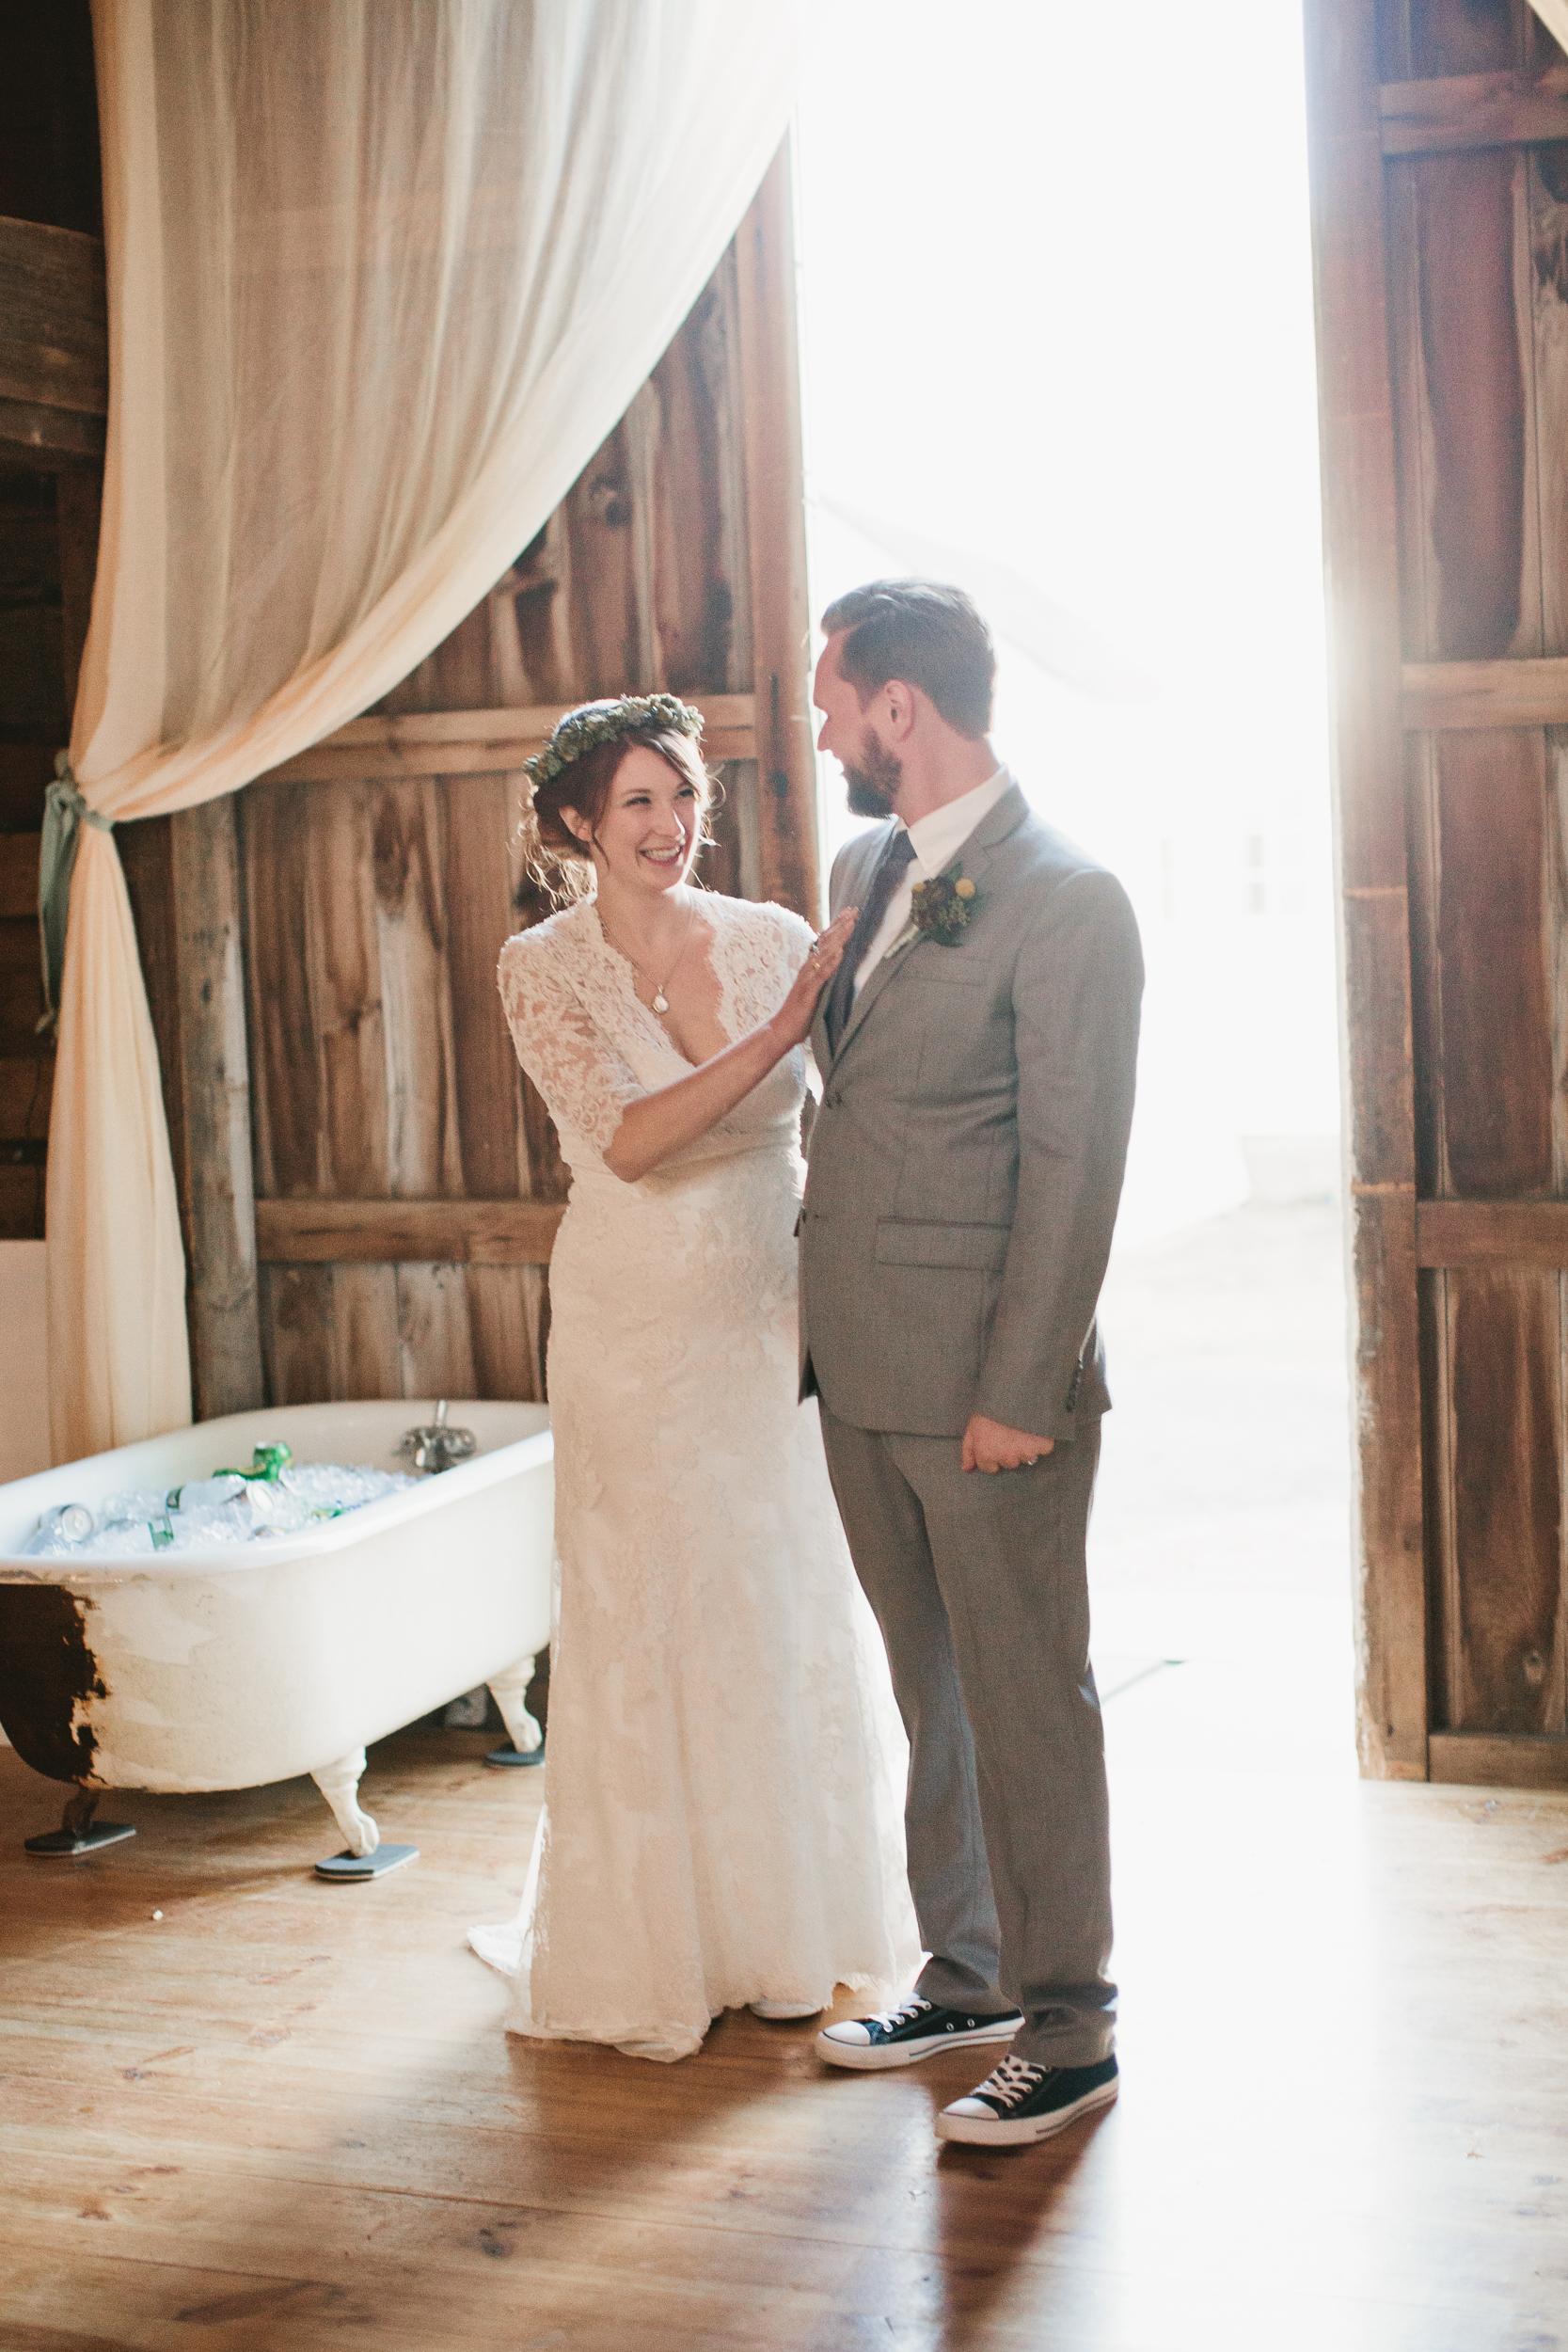 Spring-Meadows-Maine-Wedding-165.jpg